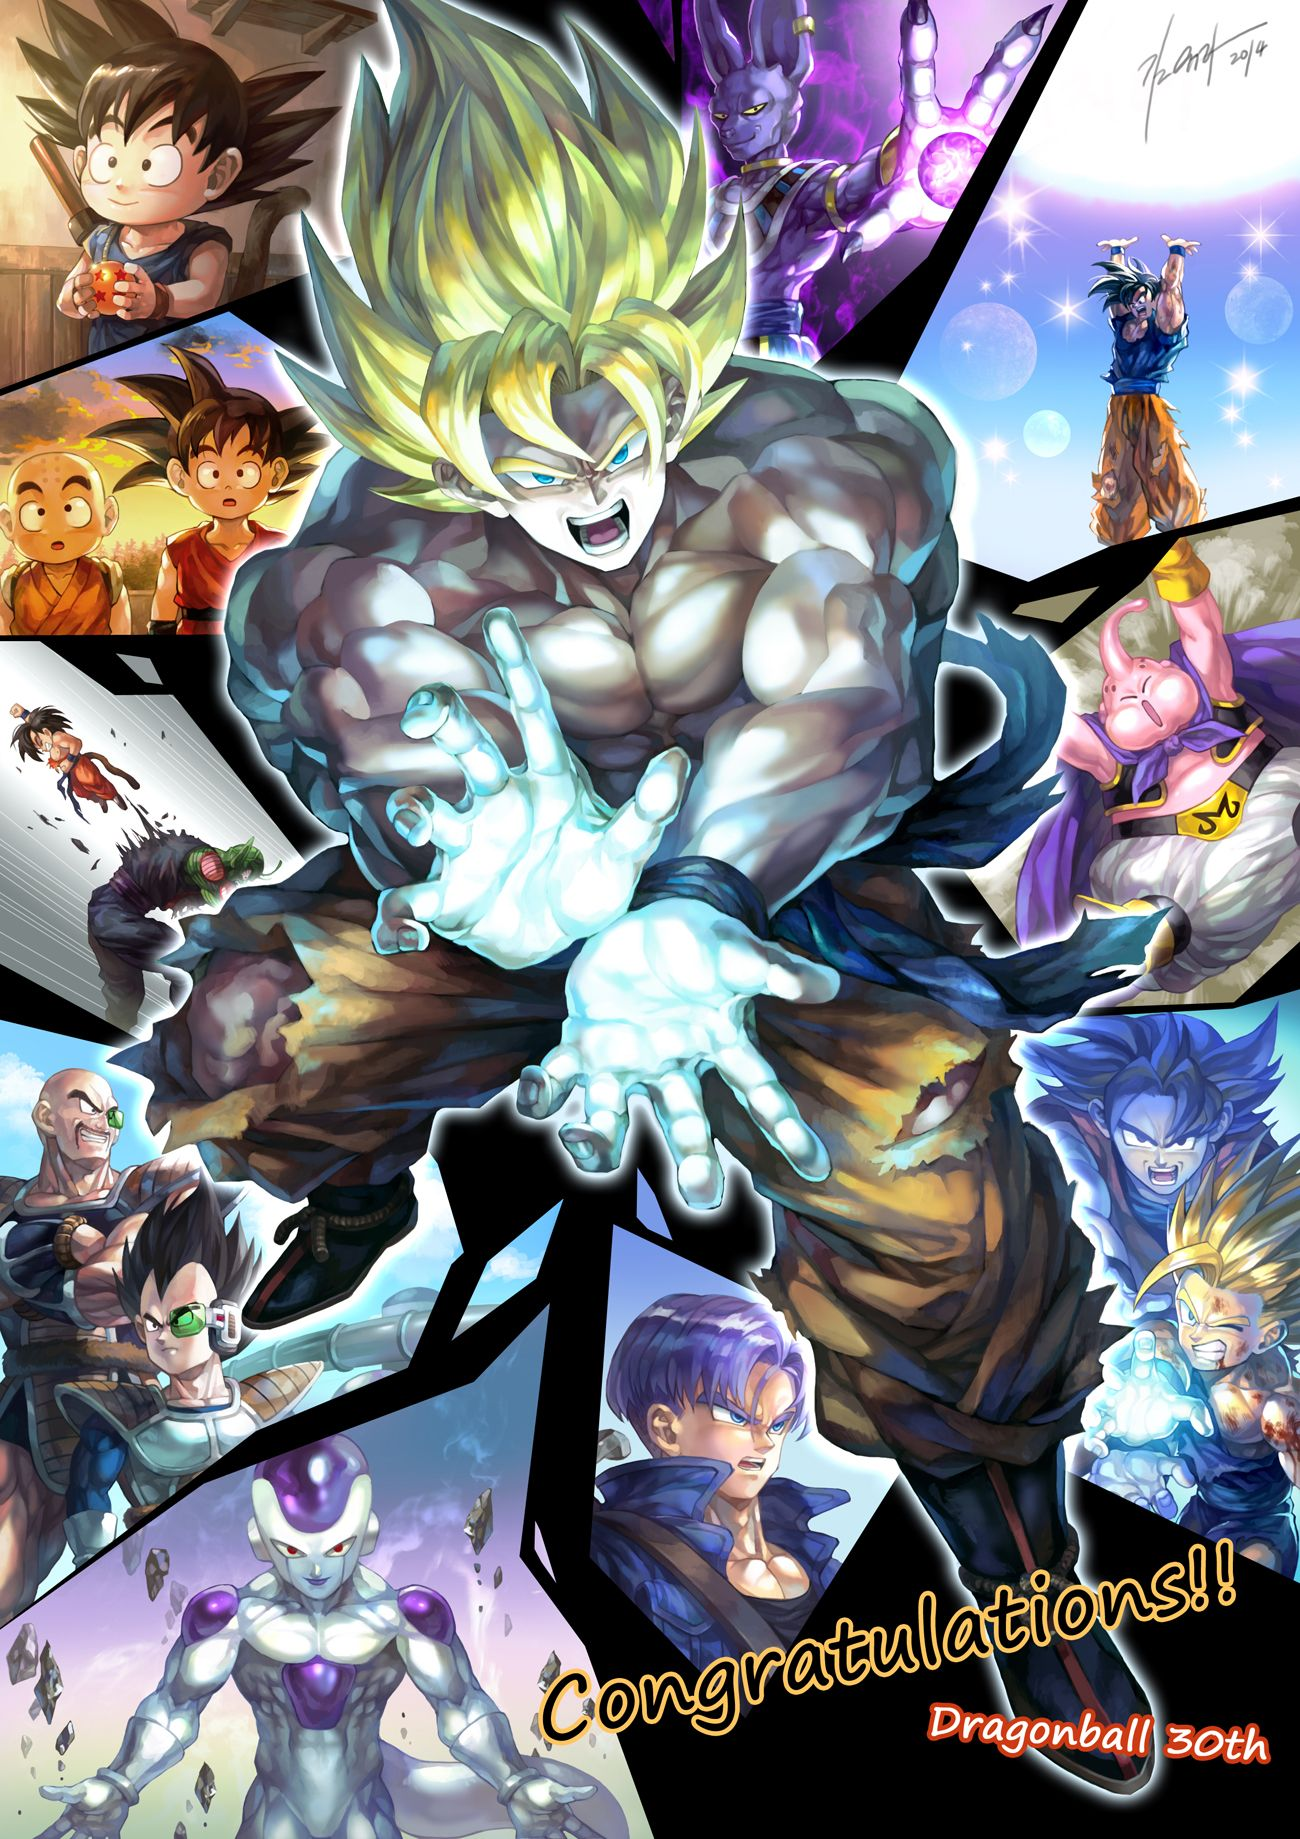 Beautiful Wallpaper Naruto Dbz - d19e7ed9045844ca3e8faebb8f303996  Snapshot_784129.jpg